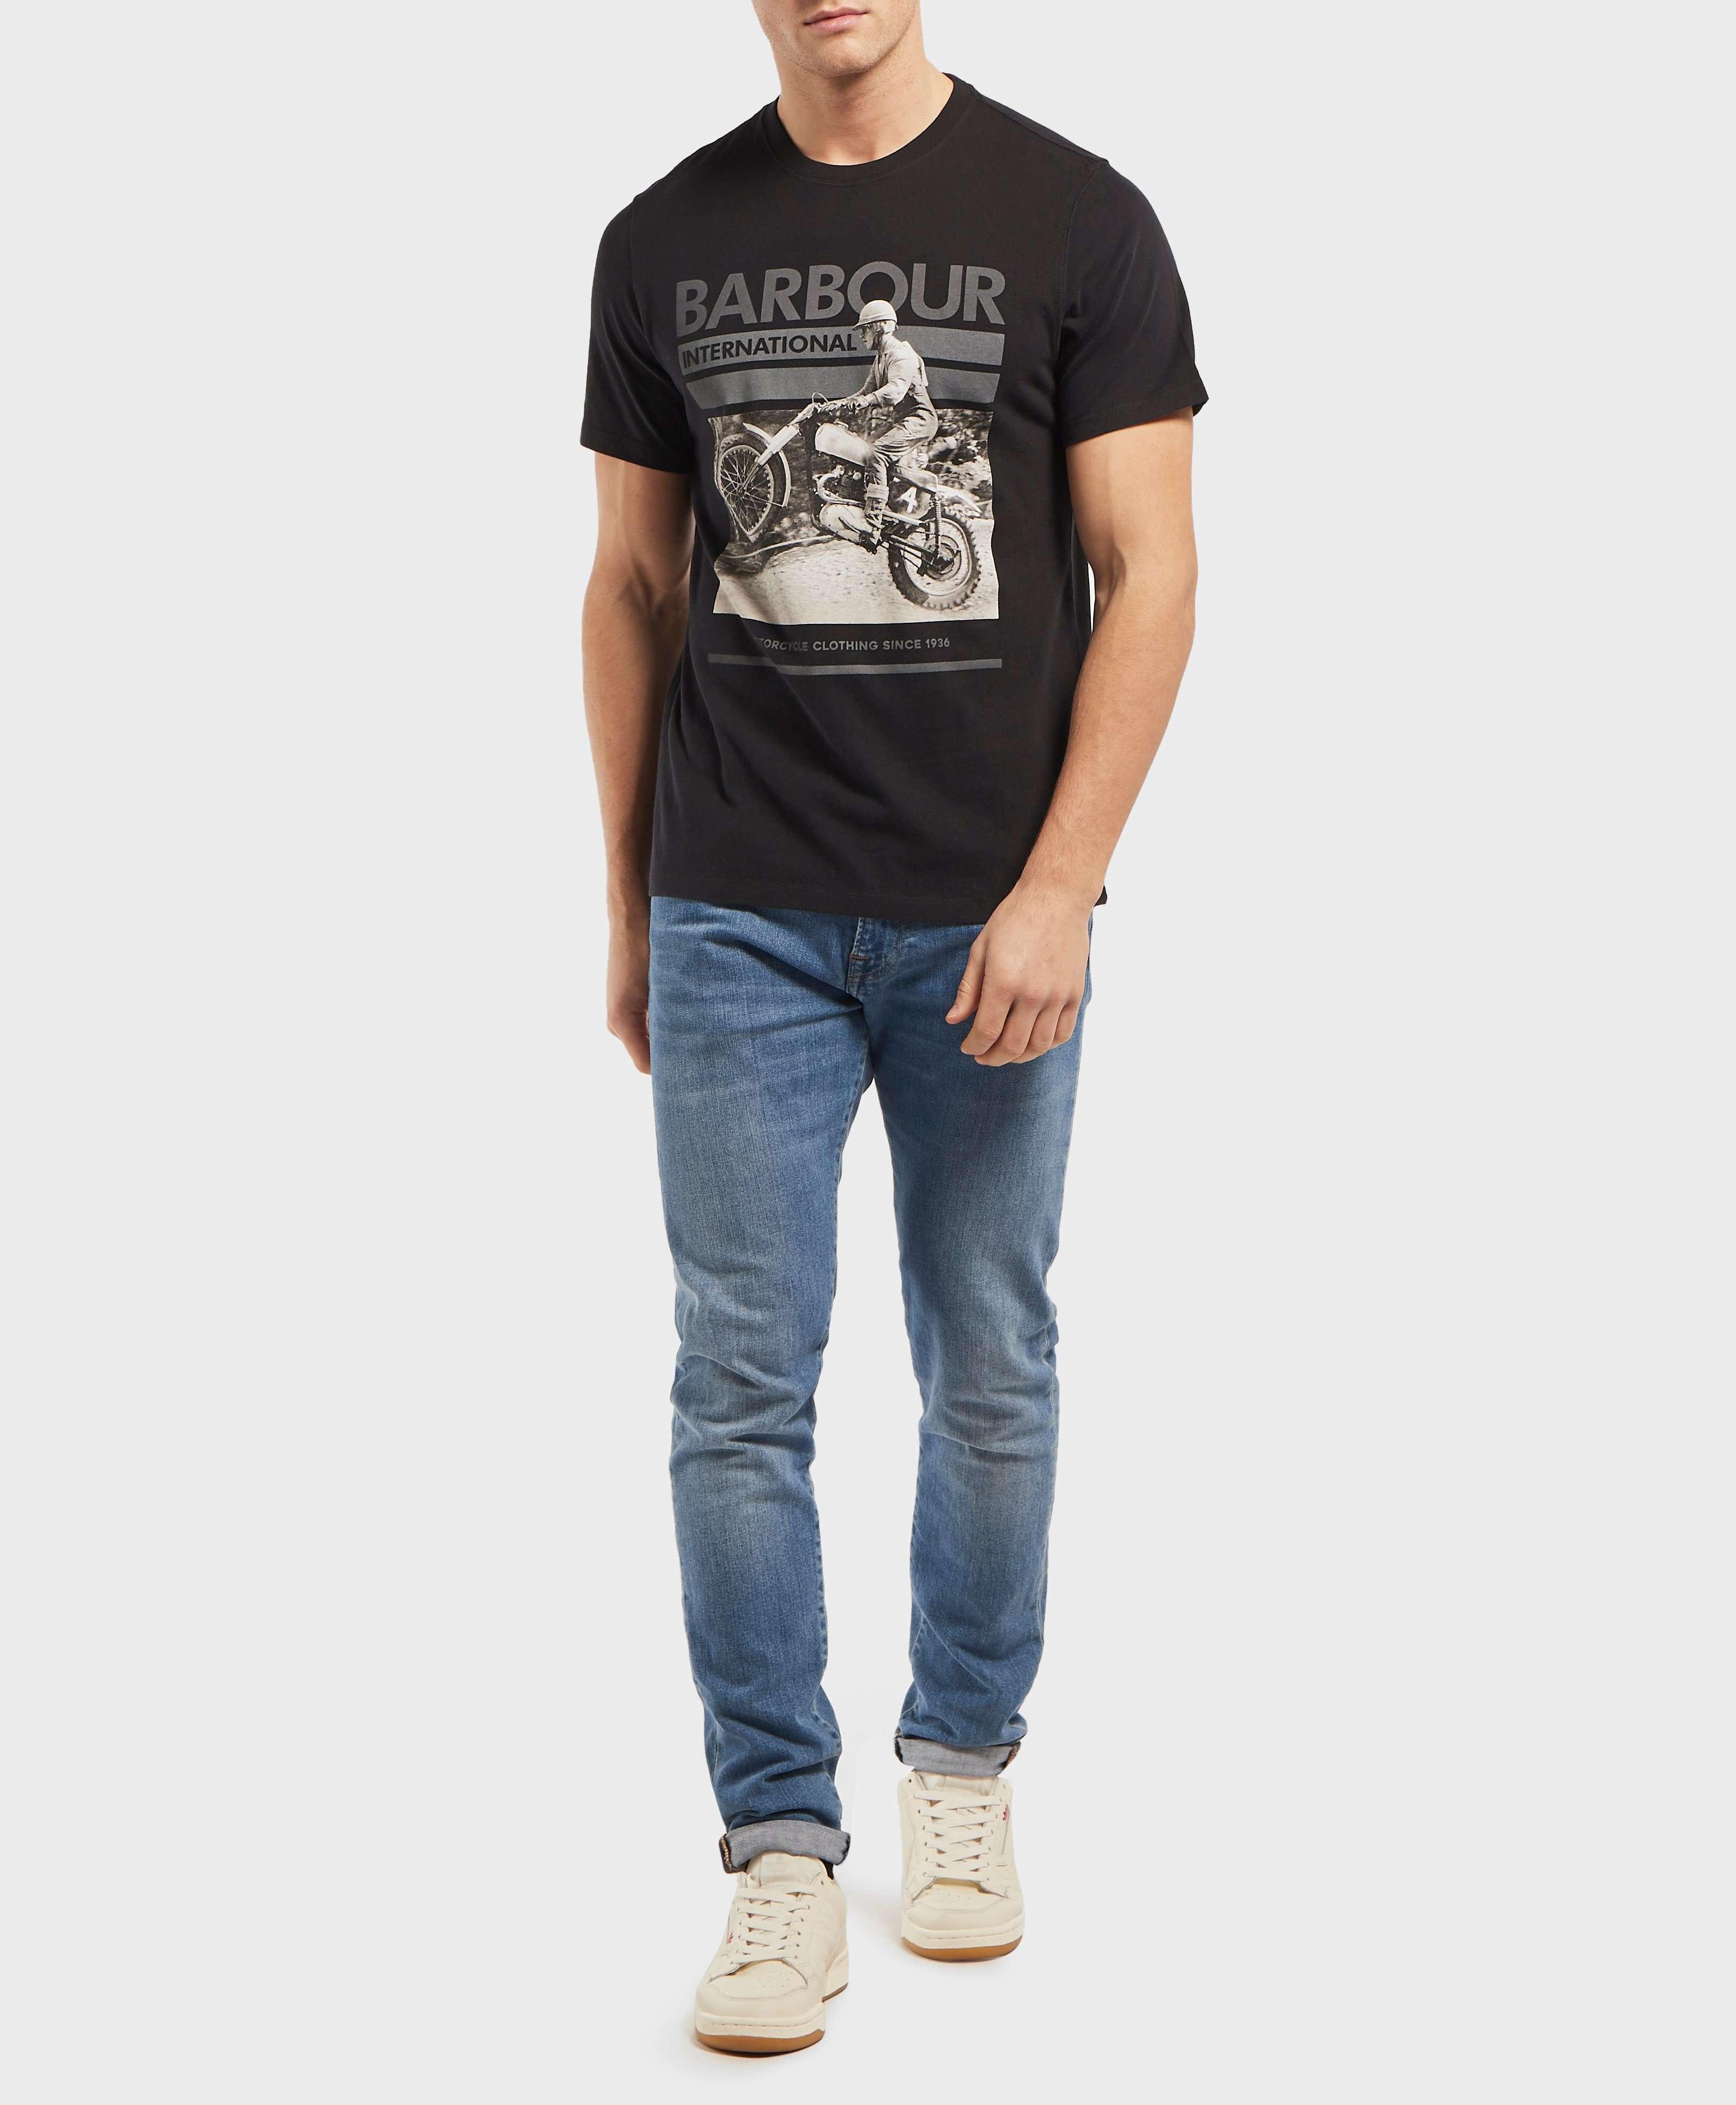 Barbour International Archive Short Sleeve T-Shirt